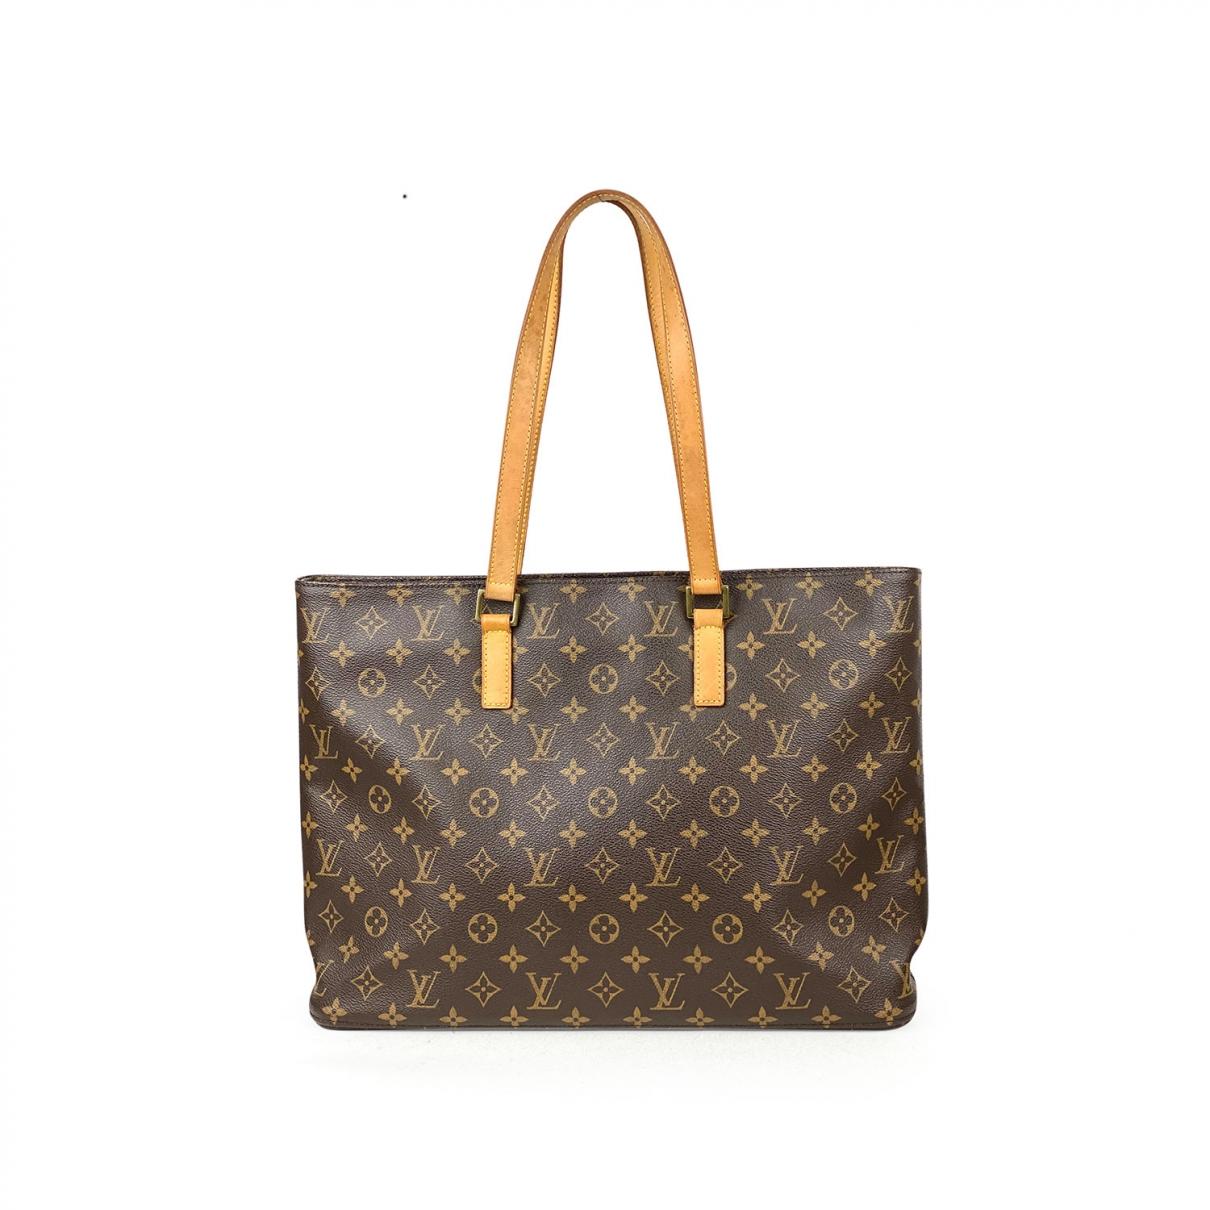 Cabas Luco de Lona Louis Vuitton